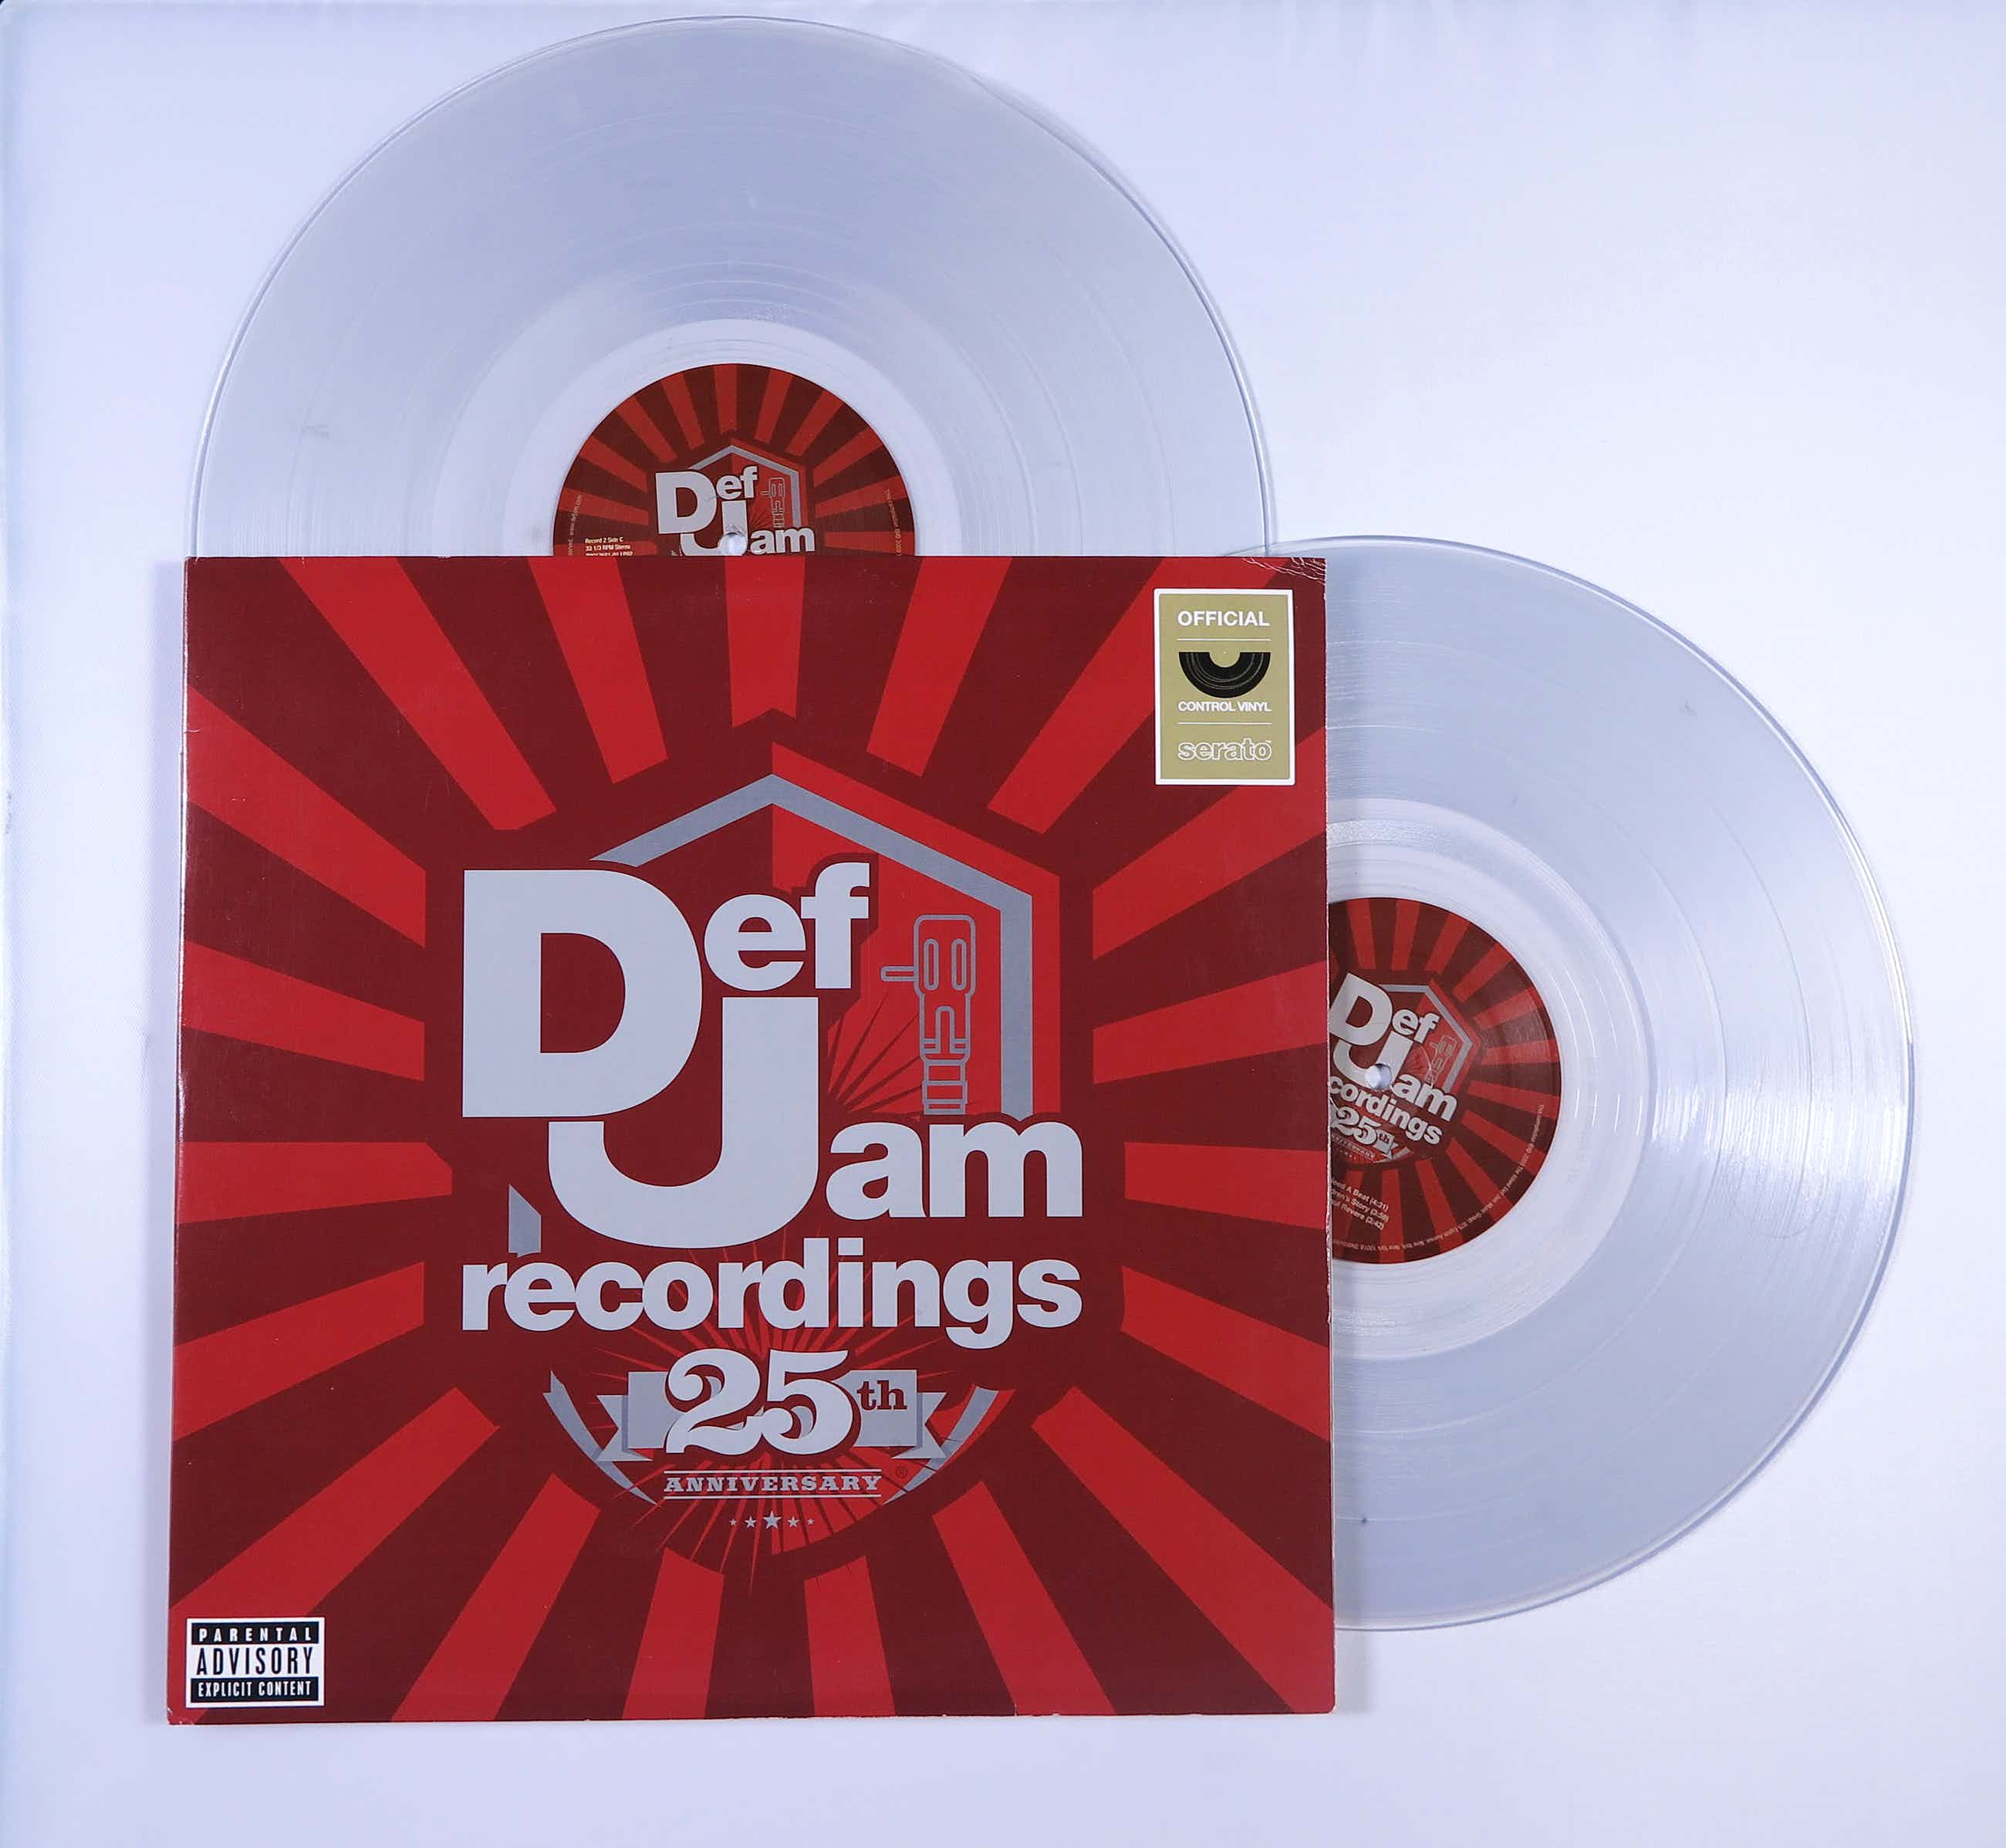 Various artists - Def Jam Recordings 25th Anniversary kopen? Bied vanaf 30!